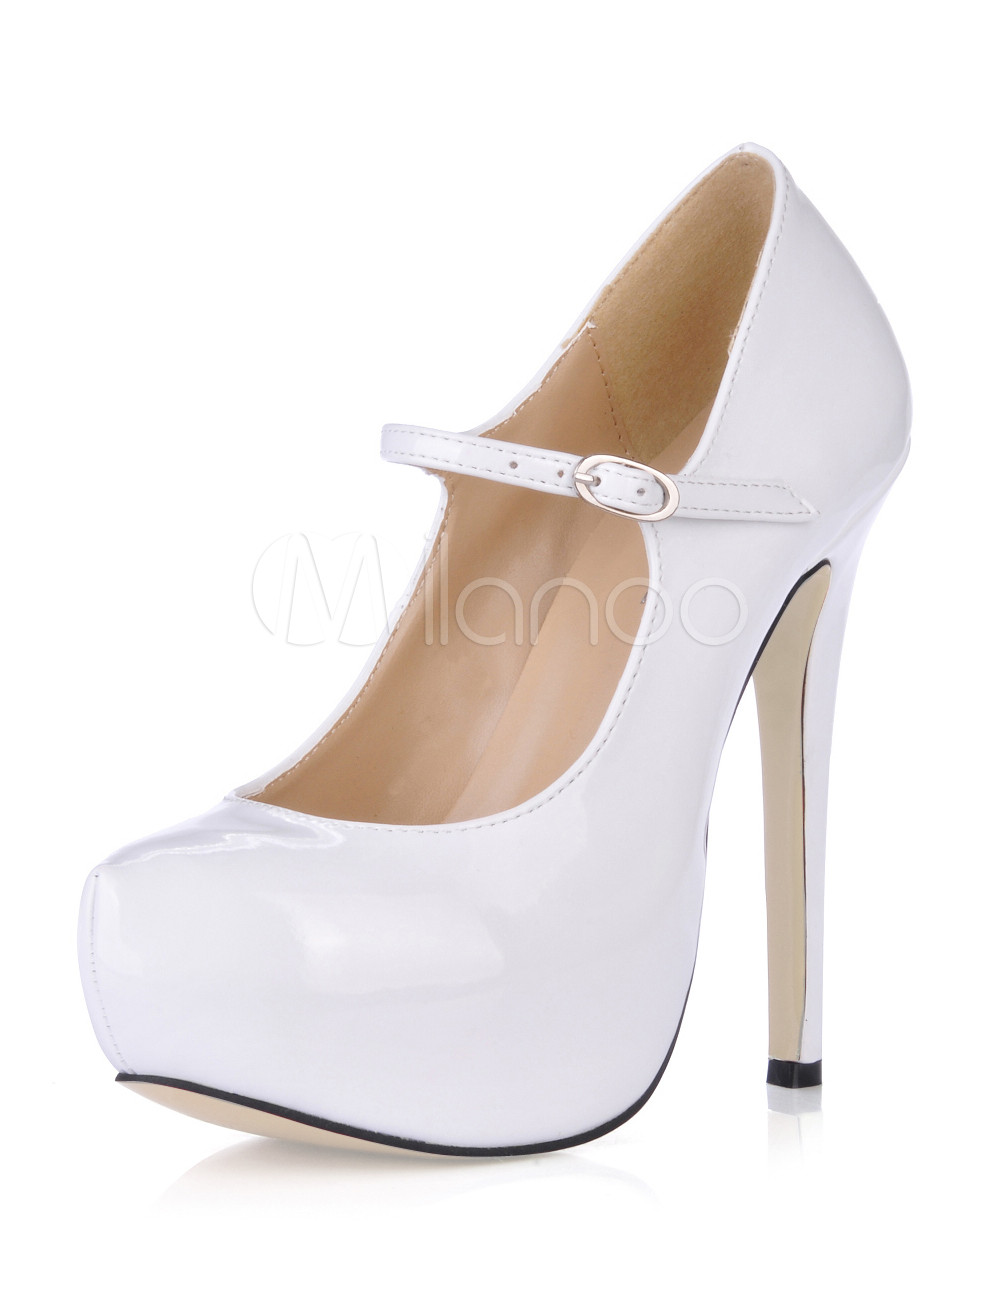 c13218a6d3b Women High Heels Platform Round Toe Mary Jane Shoes Fuchsia Stiletto ...